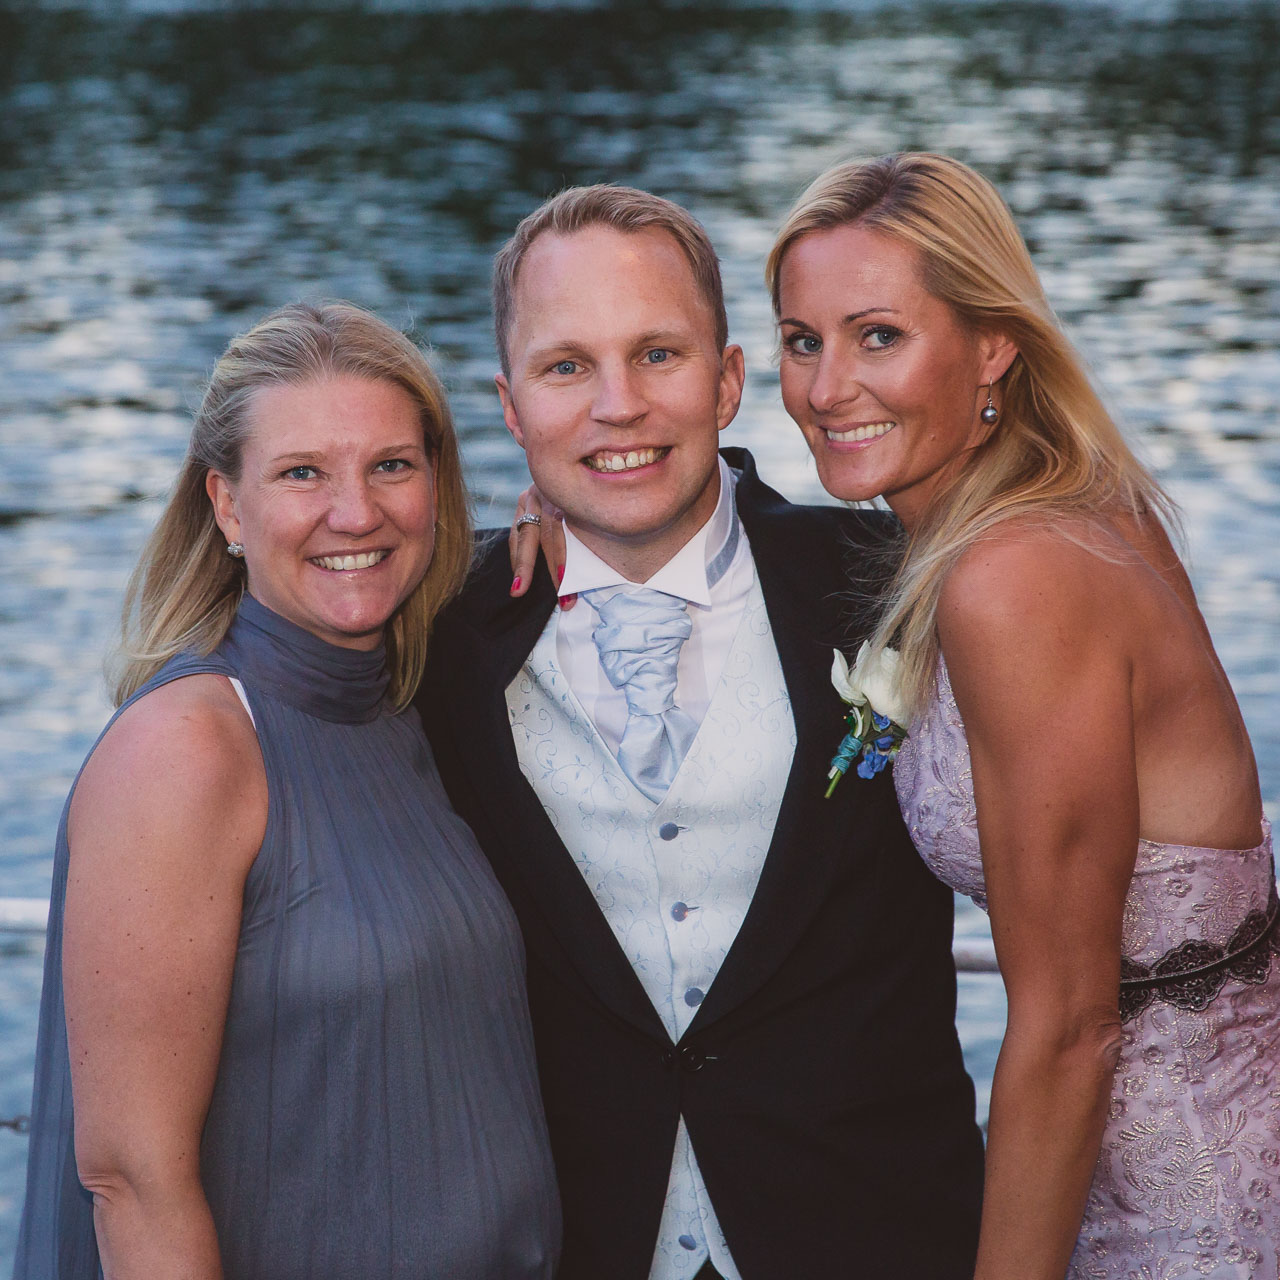 2a11ffe94f73 brollopsfotograf-stockholm-wedding-photographer-sweden-57 ...